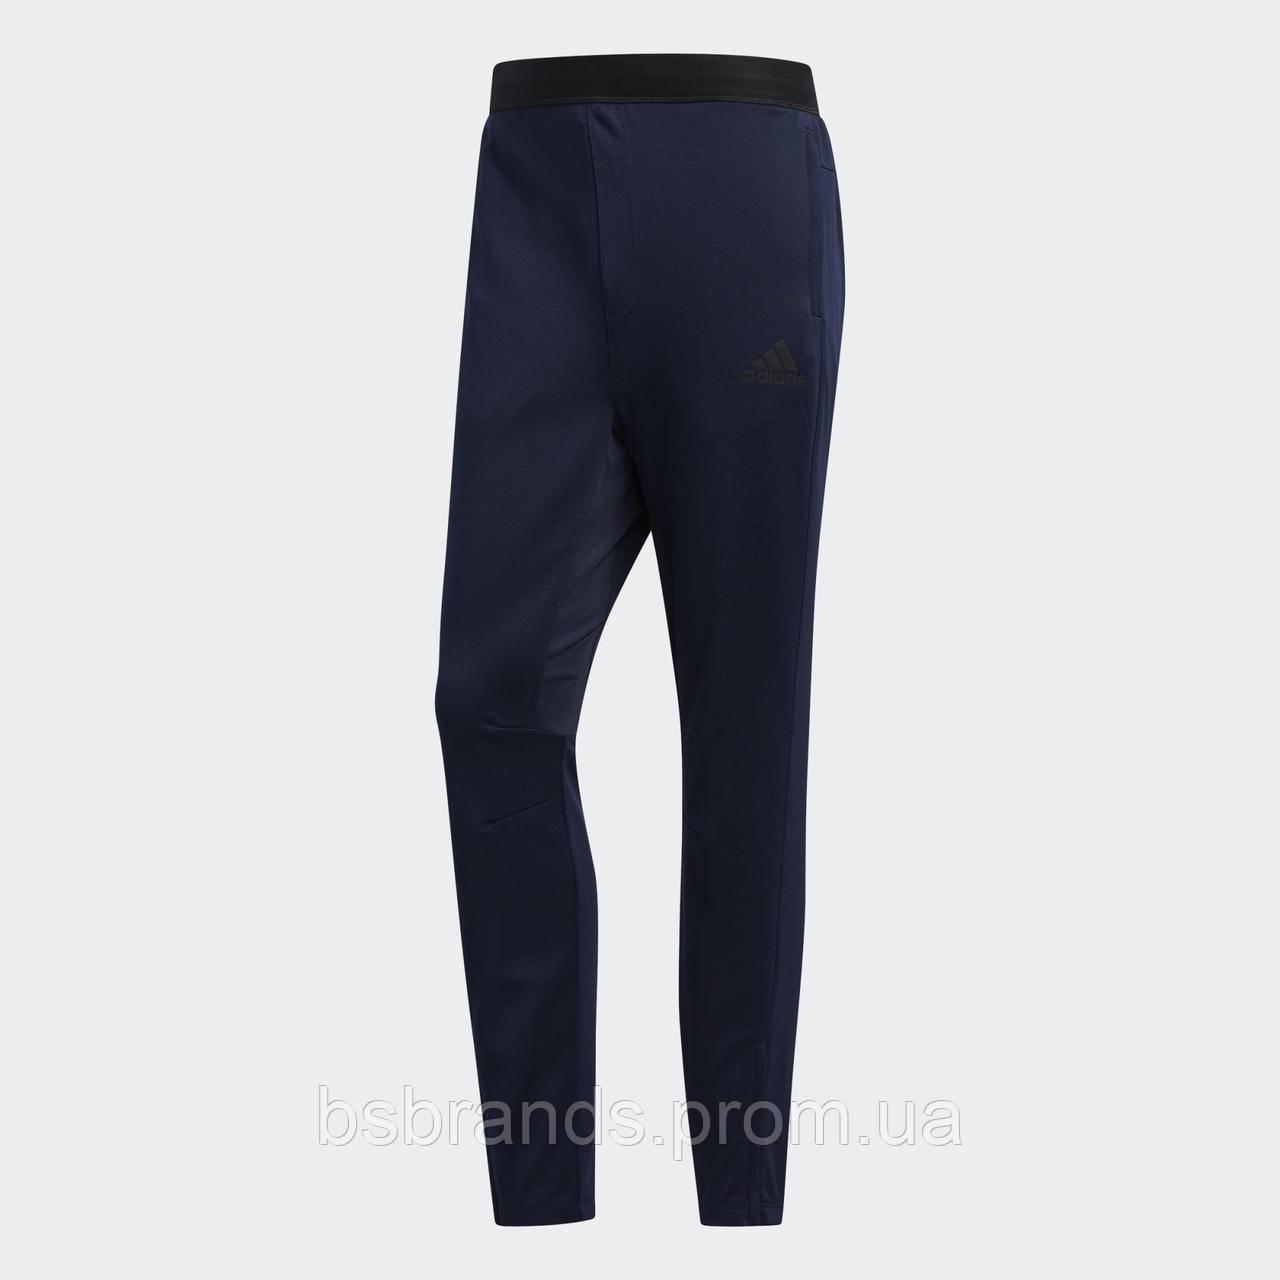 Мужские штаны адидас для фитнеса City Base FL1505 (2020/2)